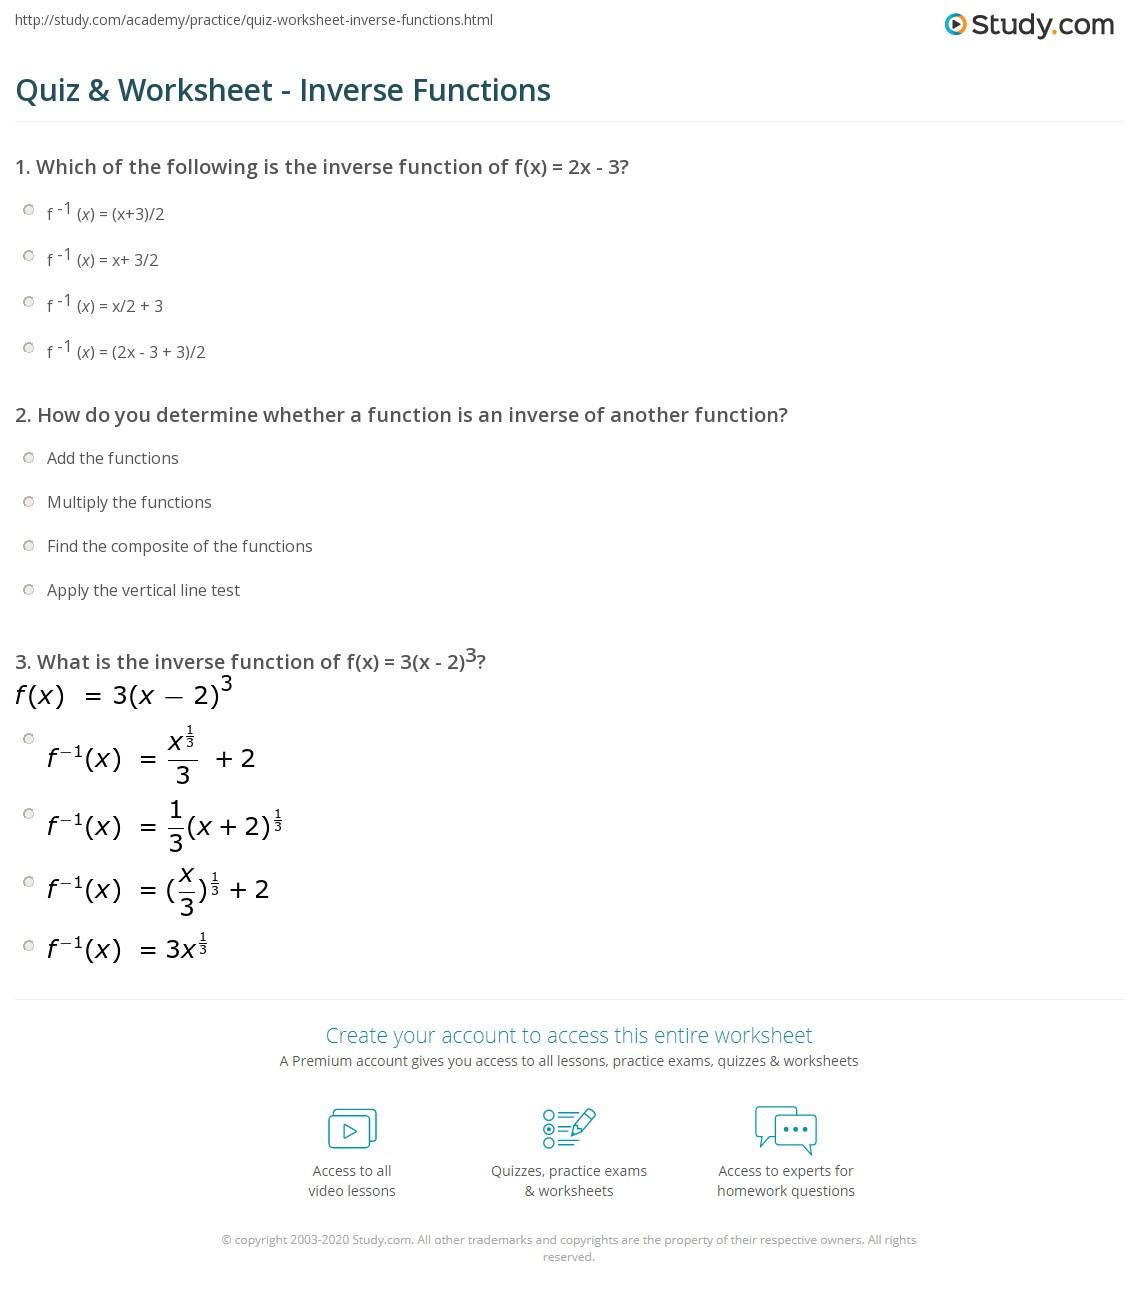 Quiz & Worksheet Inverse Functions